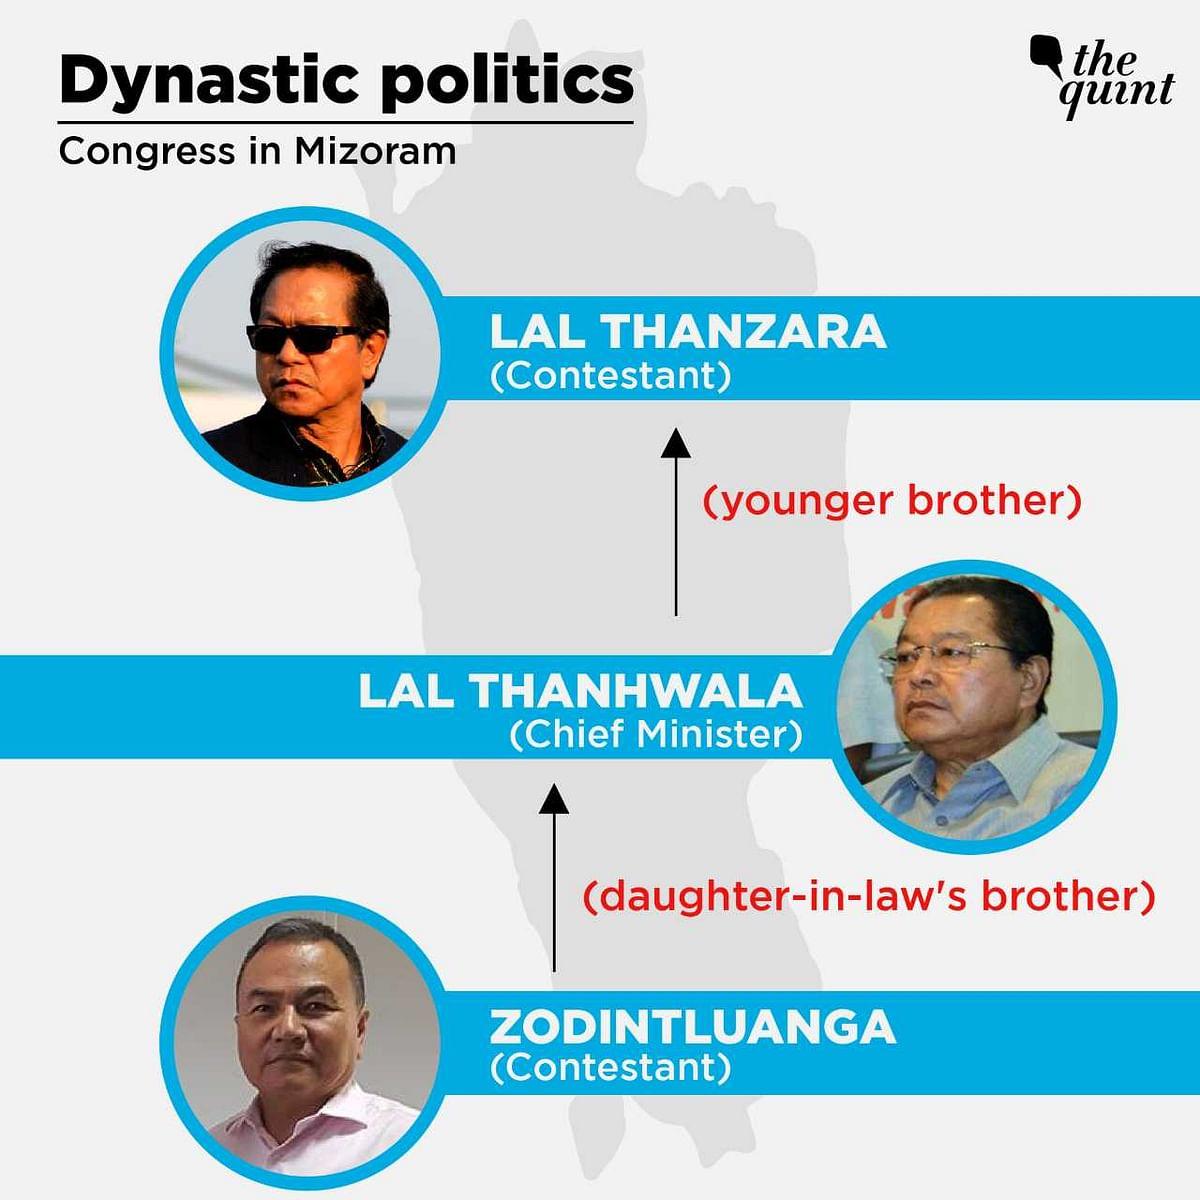 Mizoram: BJP Dark Horse in Traditional Congress-MNF Battleground?